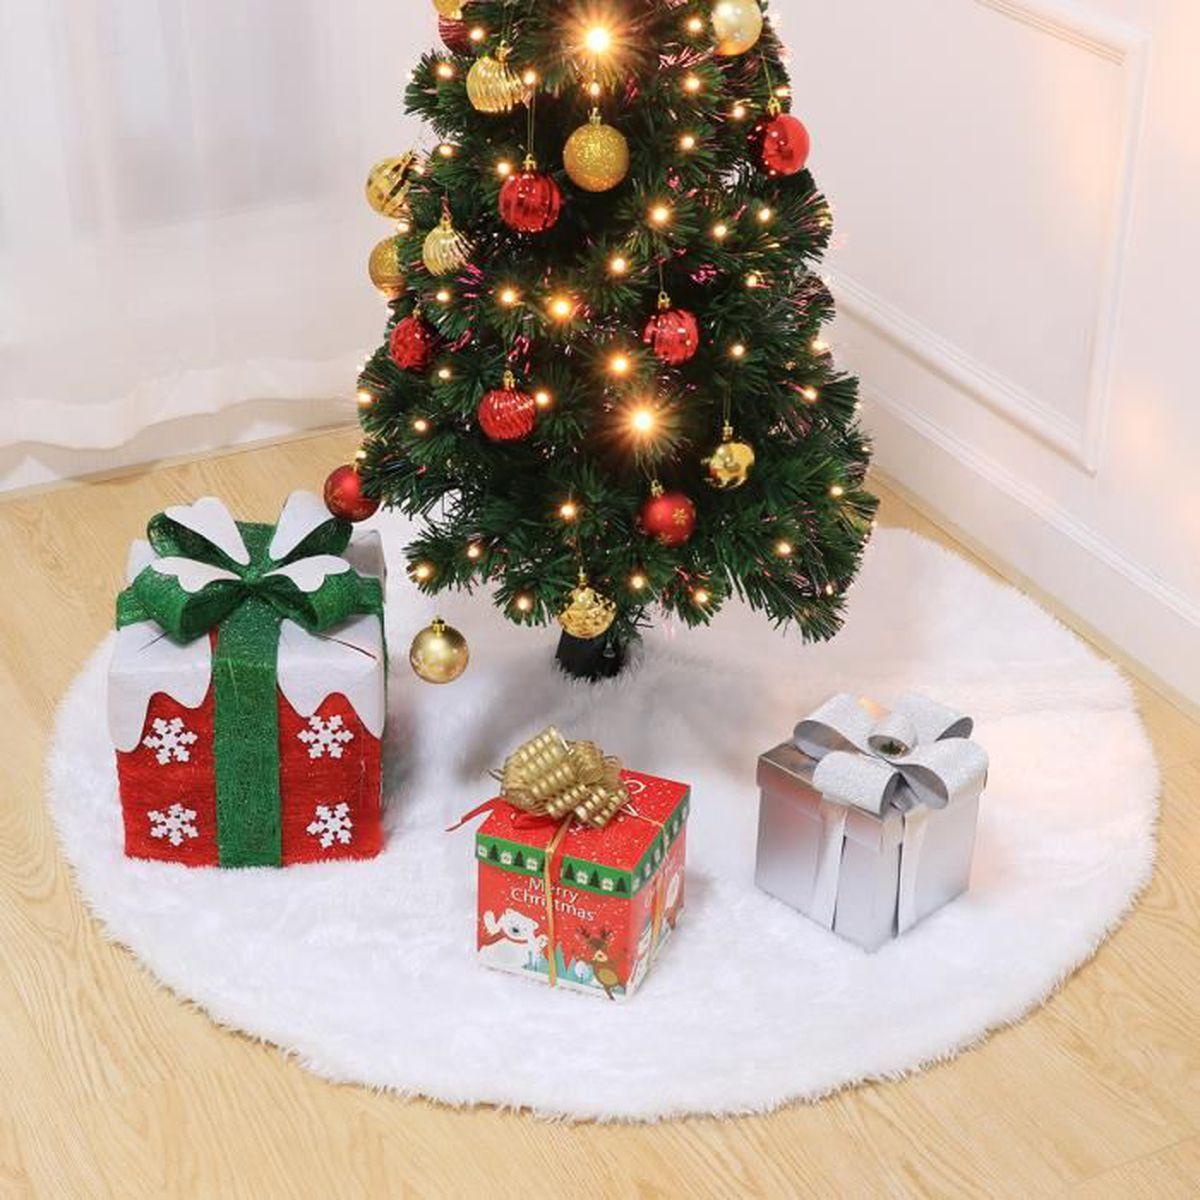 Deco Pied De Sapin tapis de sapin arbre de noël amosfun arbre de noël jupe doux